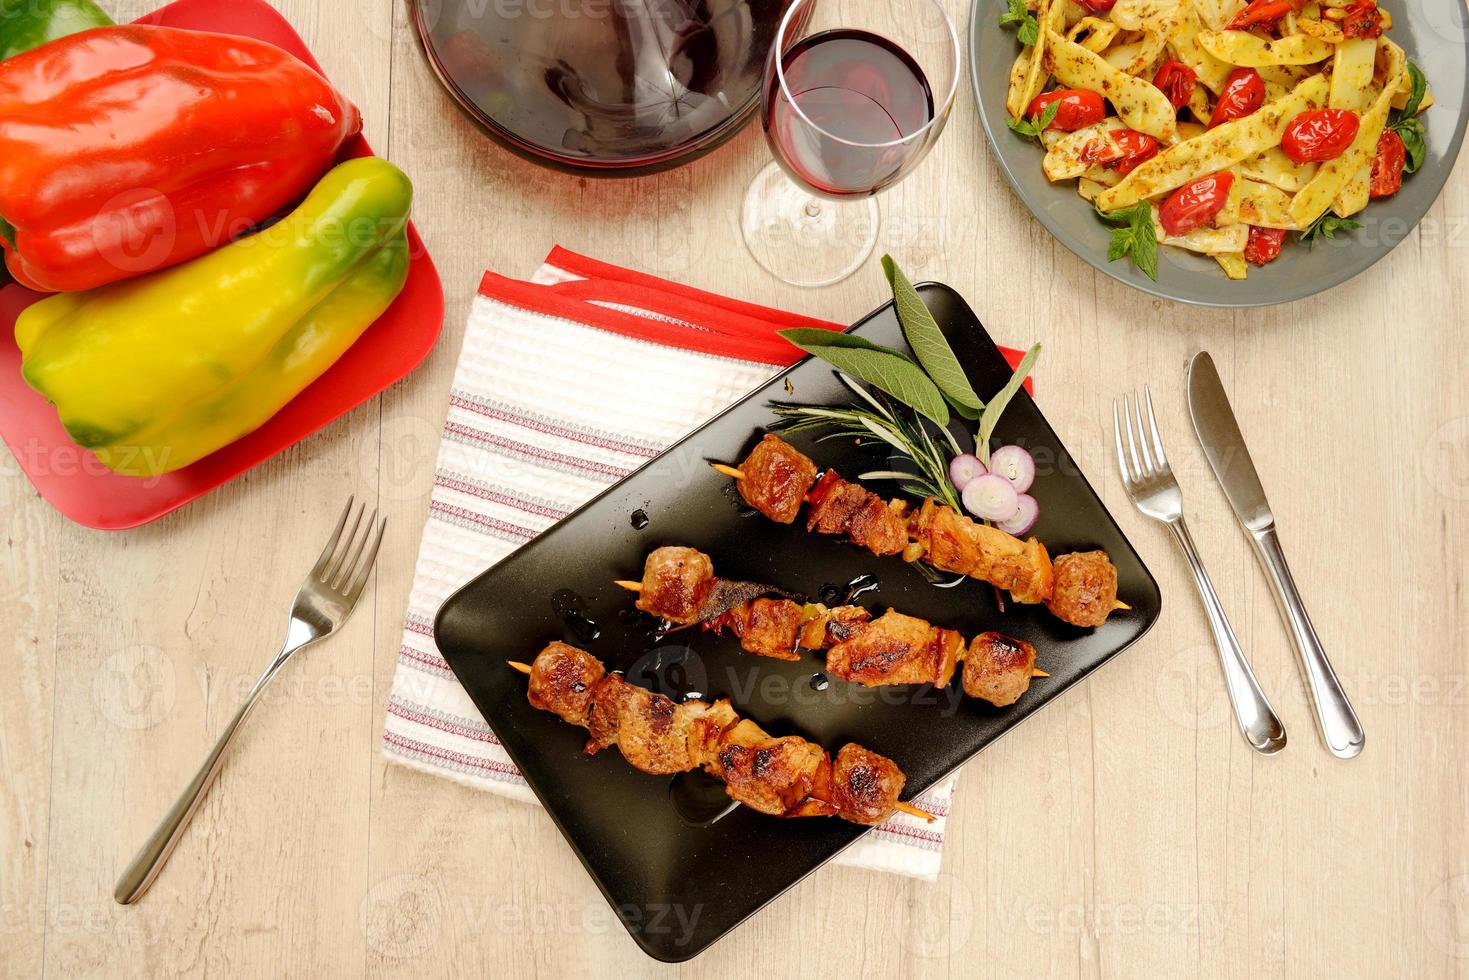 spiedini di carne cotti pronti da mangiare foto